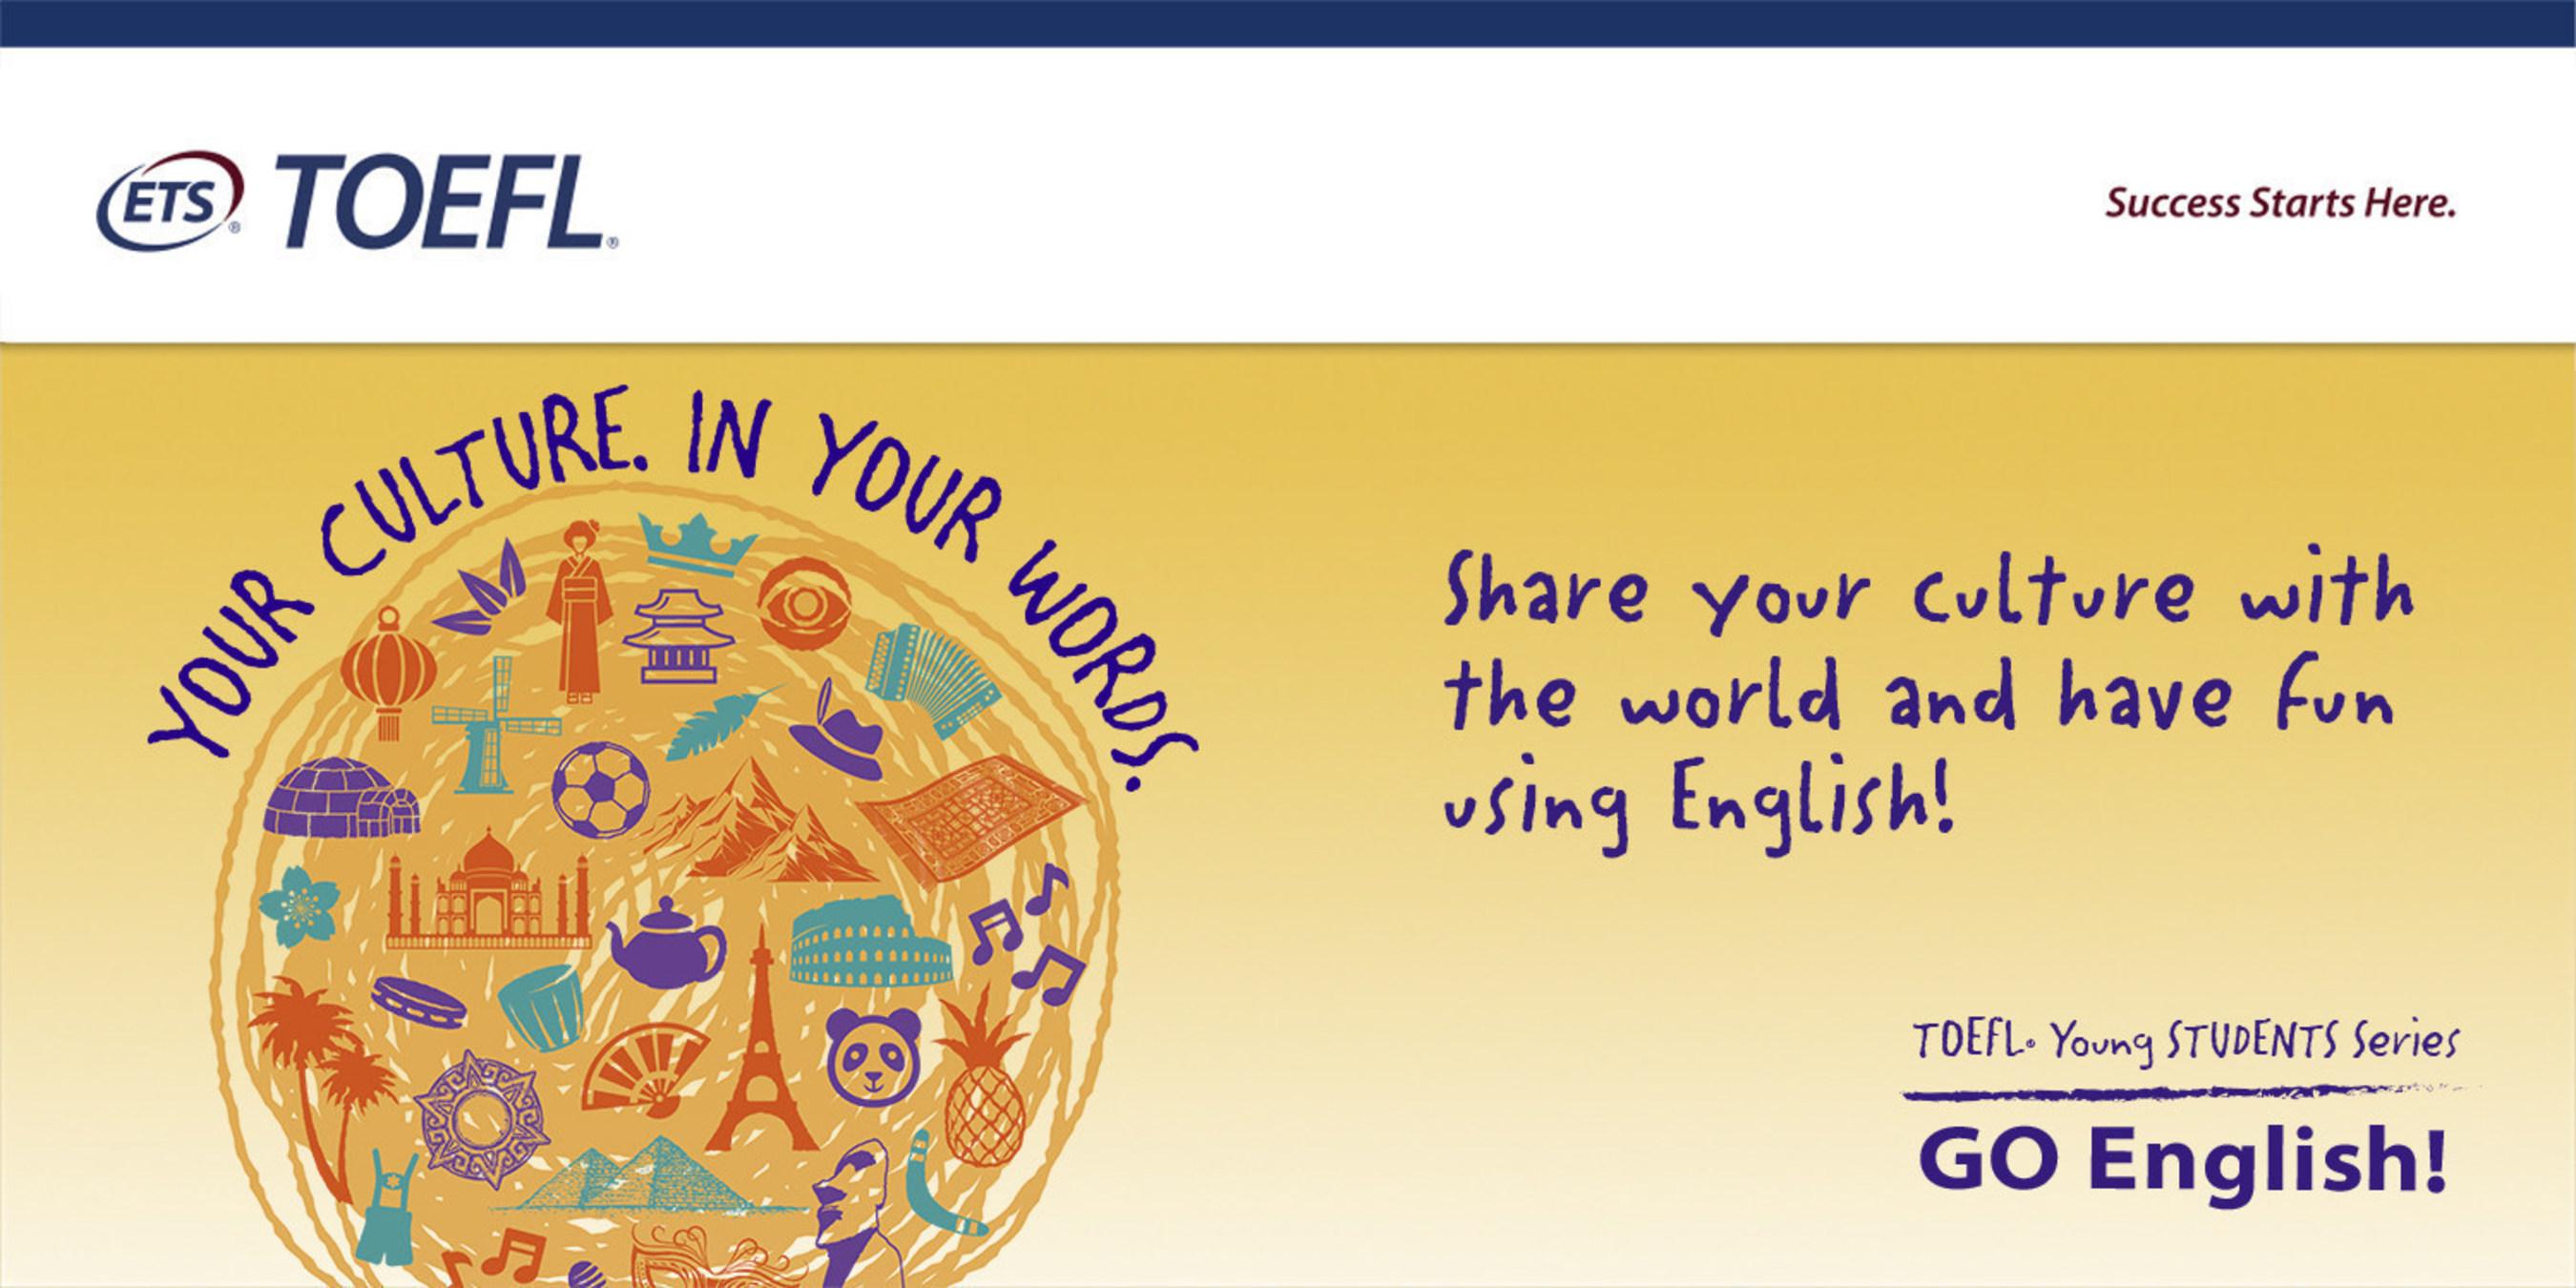 Projekt TOEFL® Young Students Series GO English! in der nächsten Runde